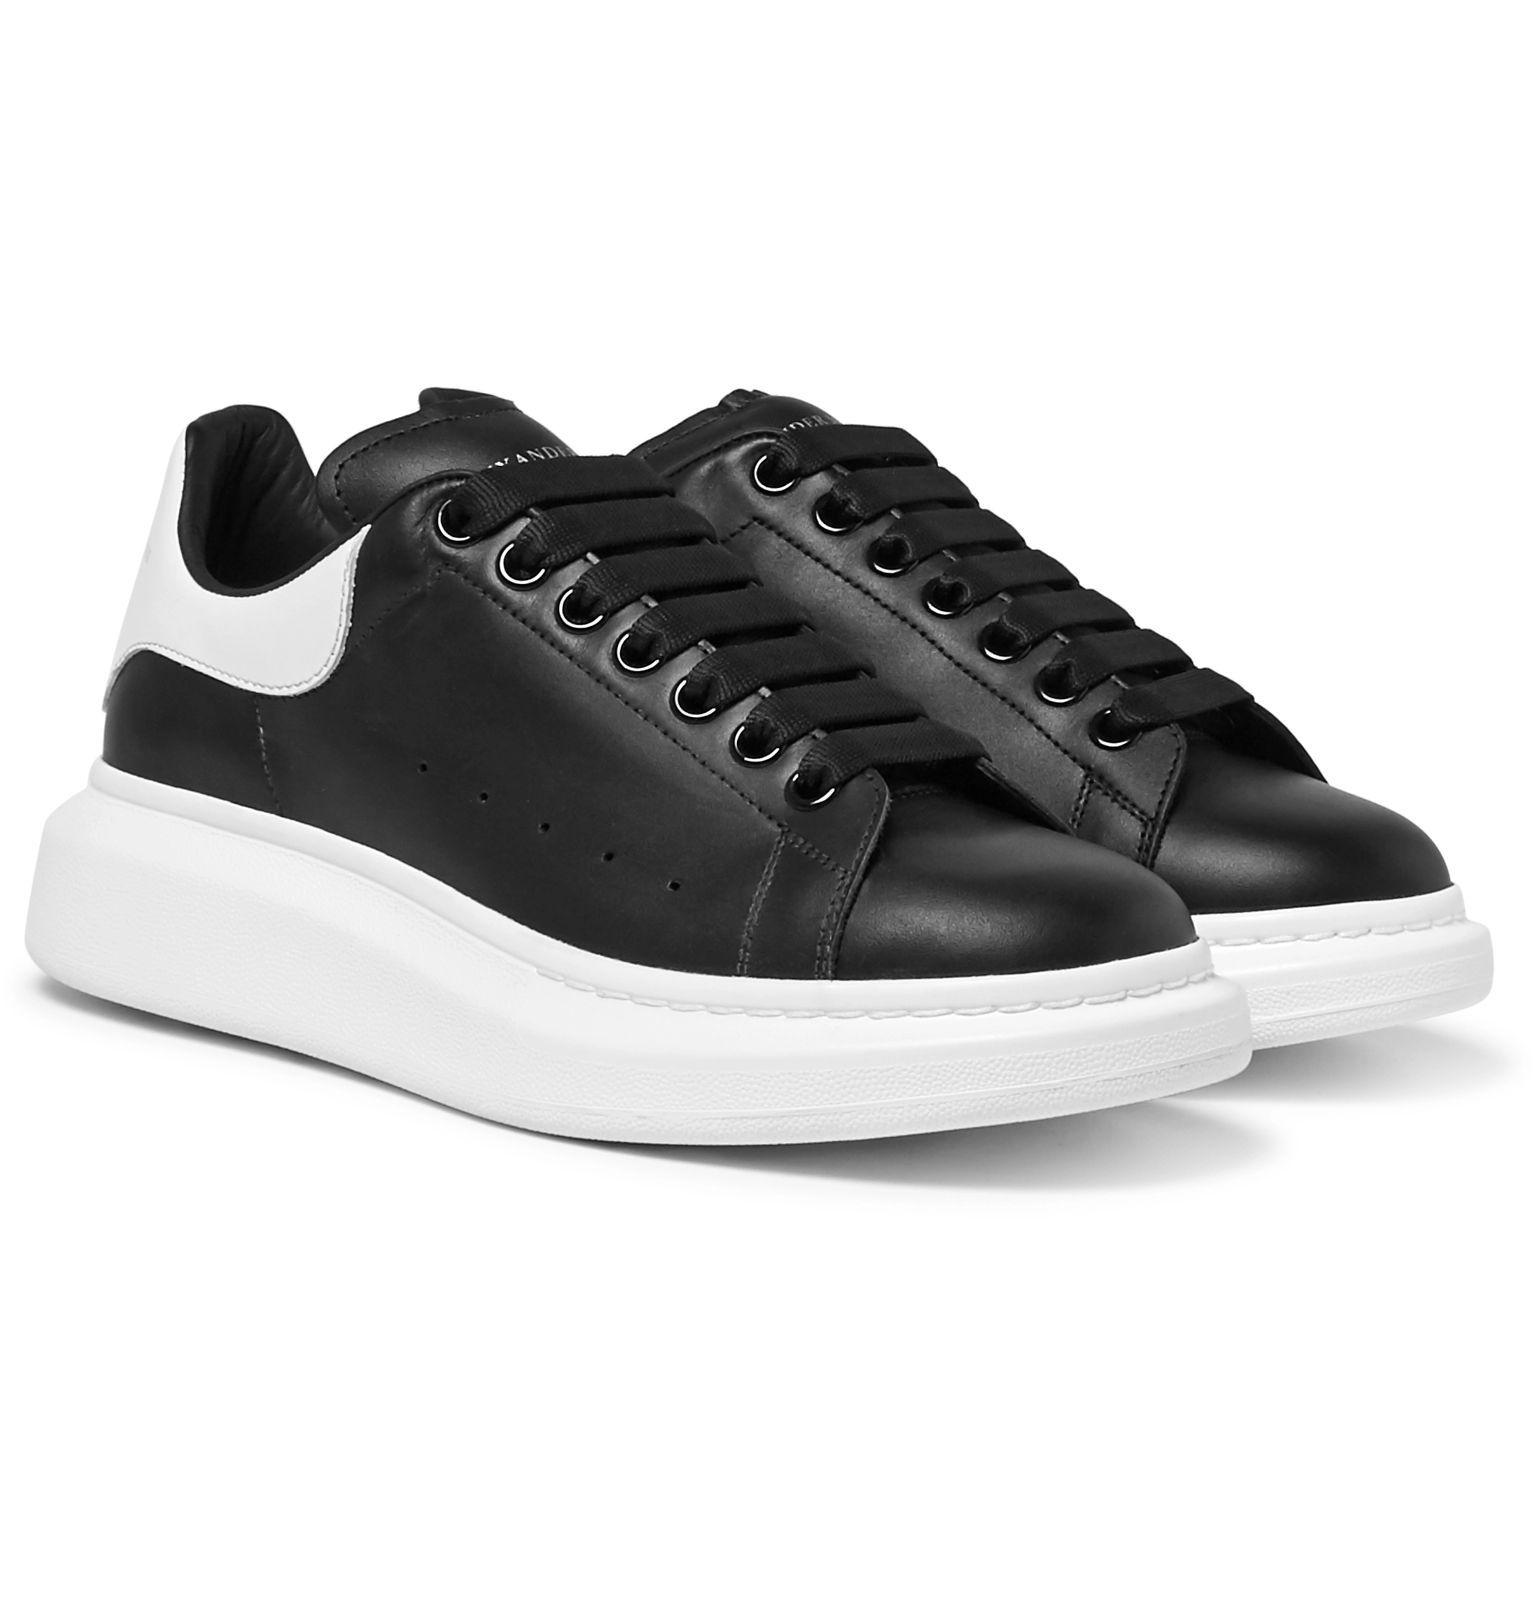 Alexander McQueen McQ sneakers 波鞋休閑鞋(閃藍銀底色)size 35, 35.5